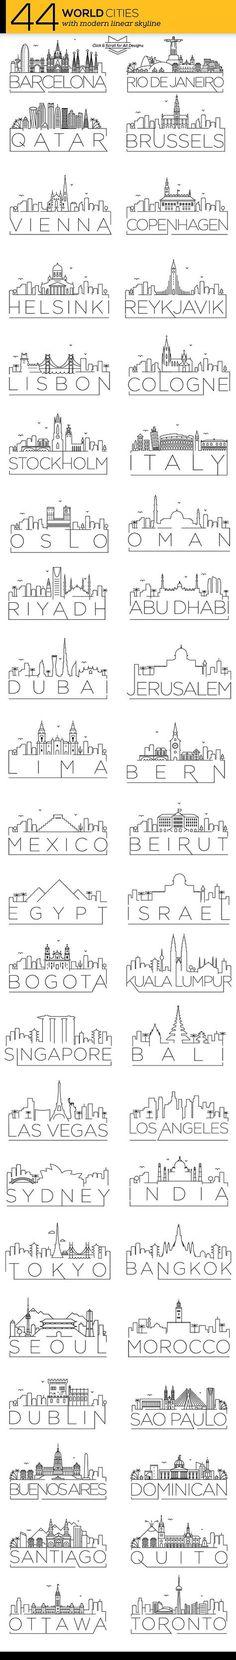 44 Different World Cities Skyline @creativework247